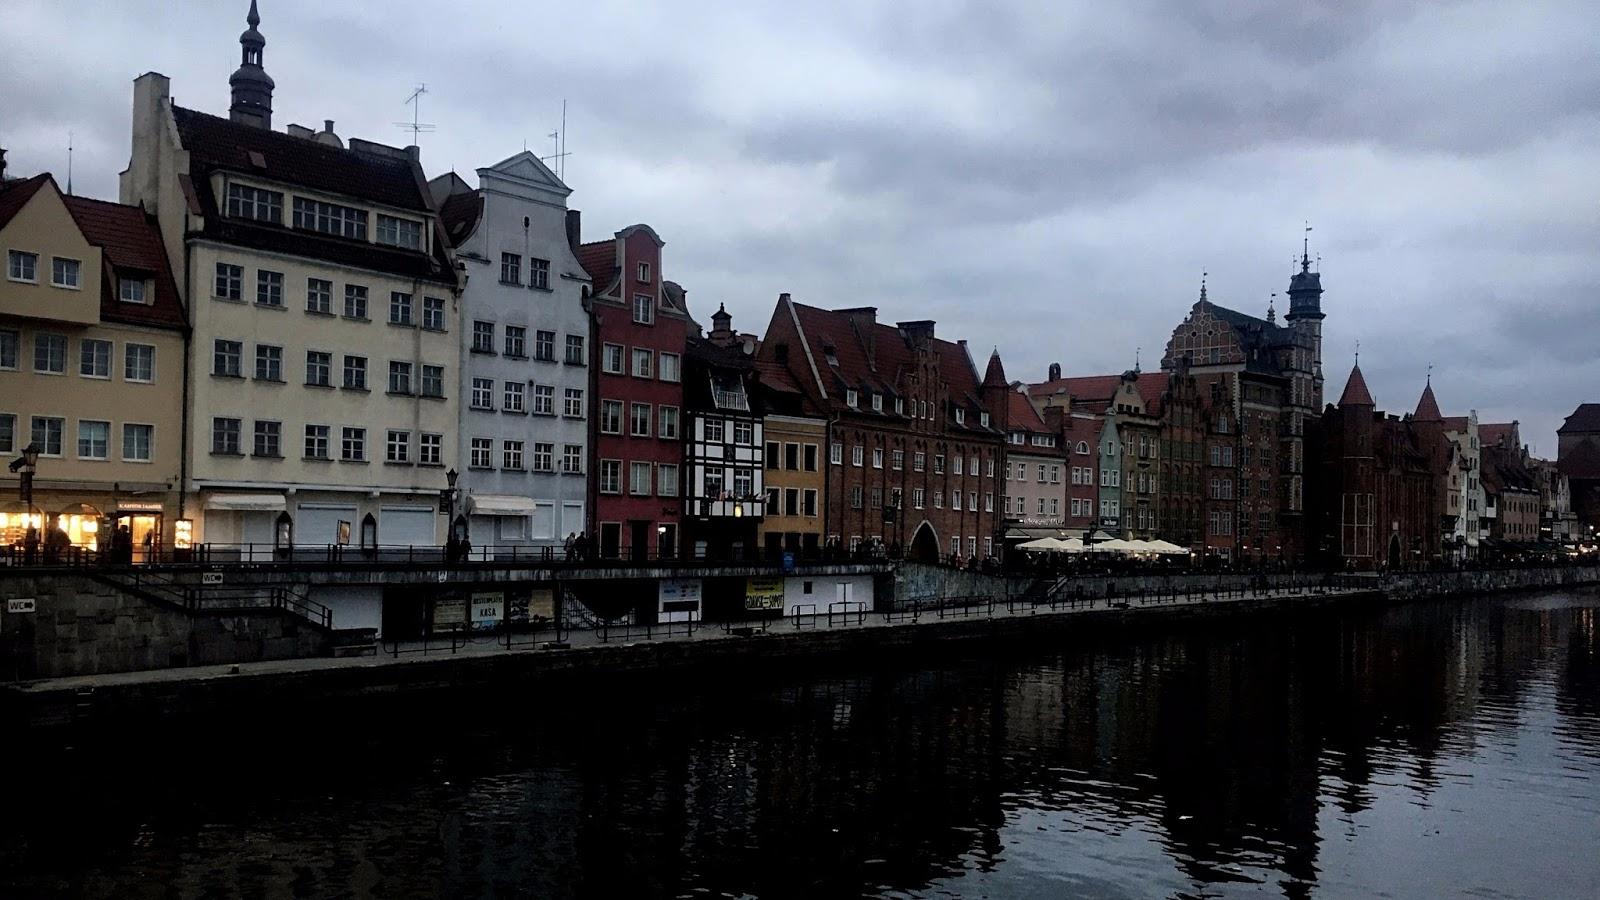 budget friendly winter city break destinations